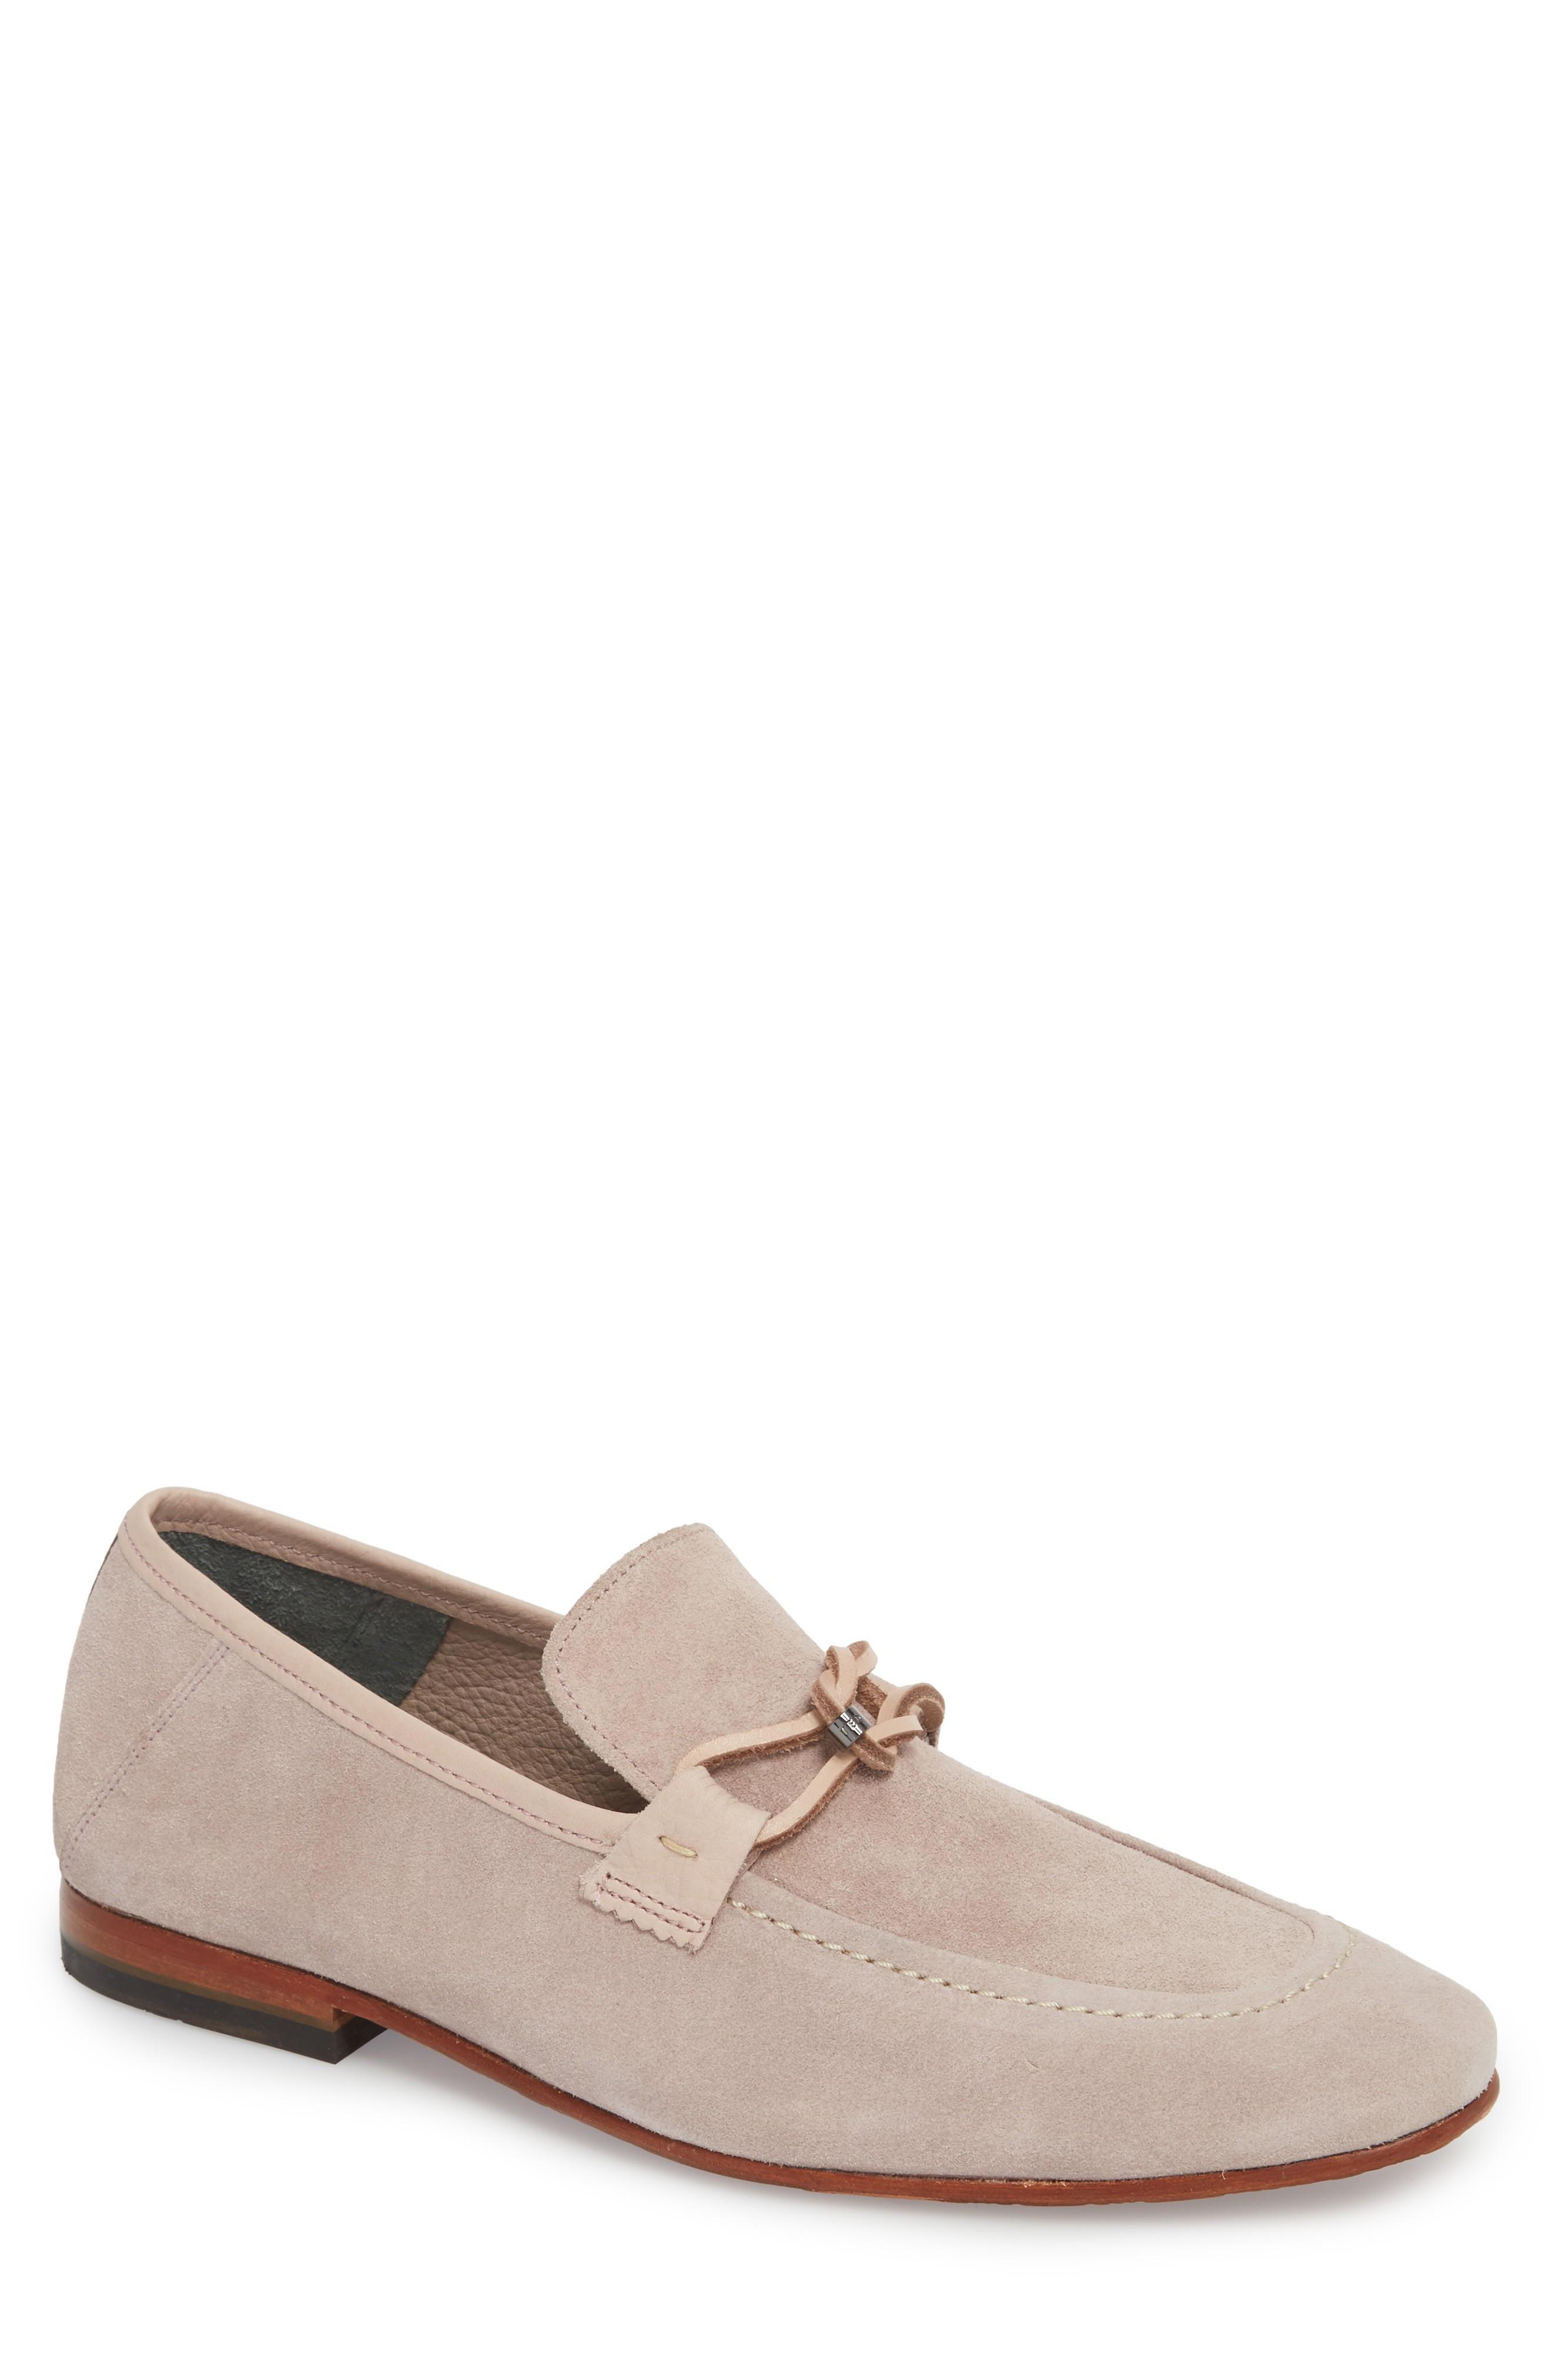 Ted Baker Hoppken Convertible Knotted Loafer In Light Pink Suede